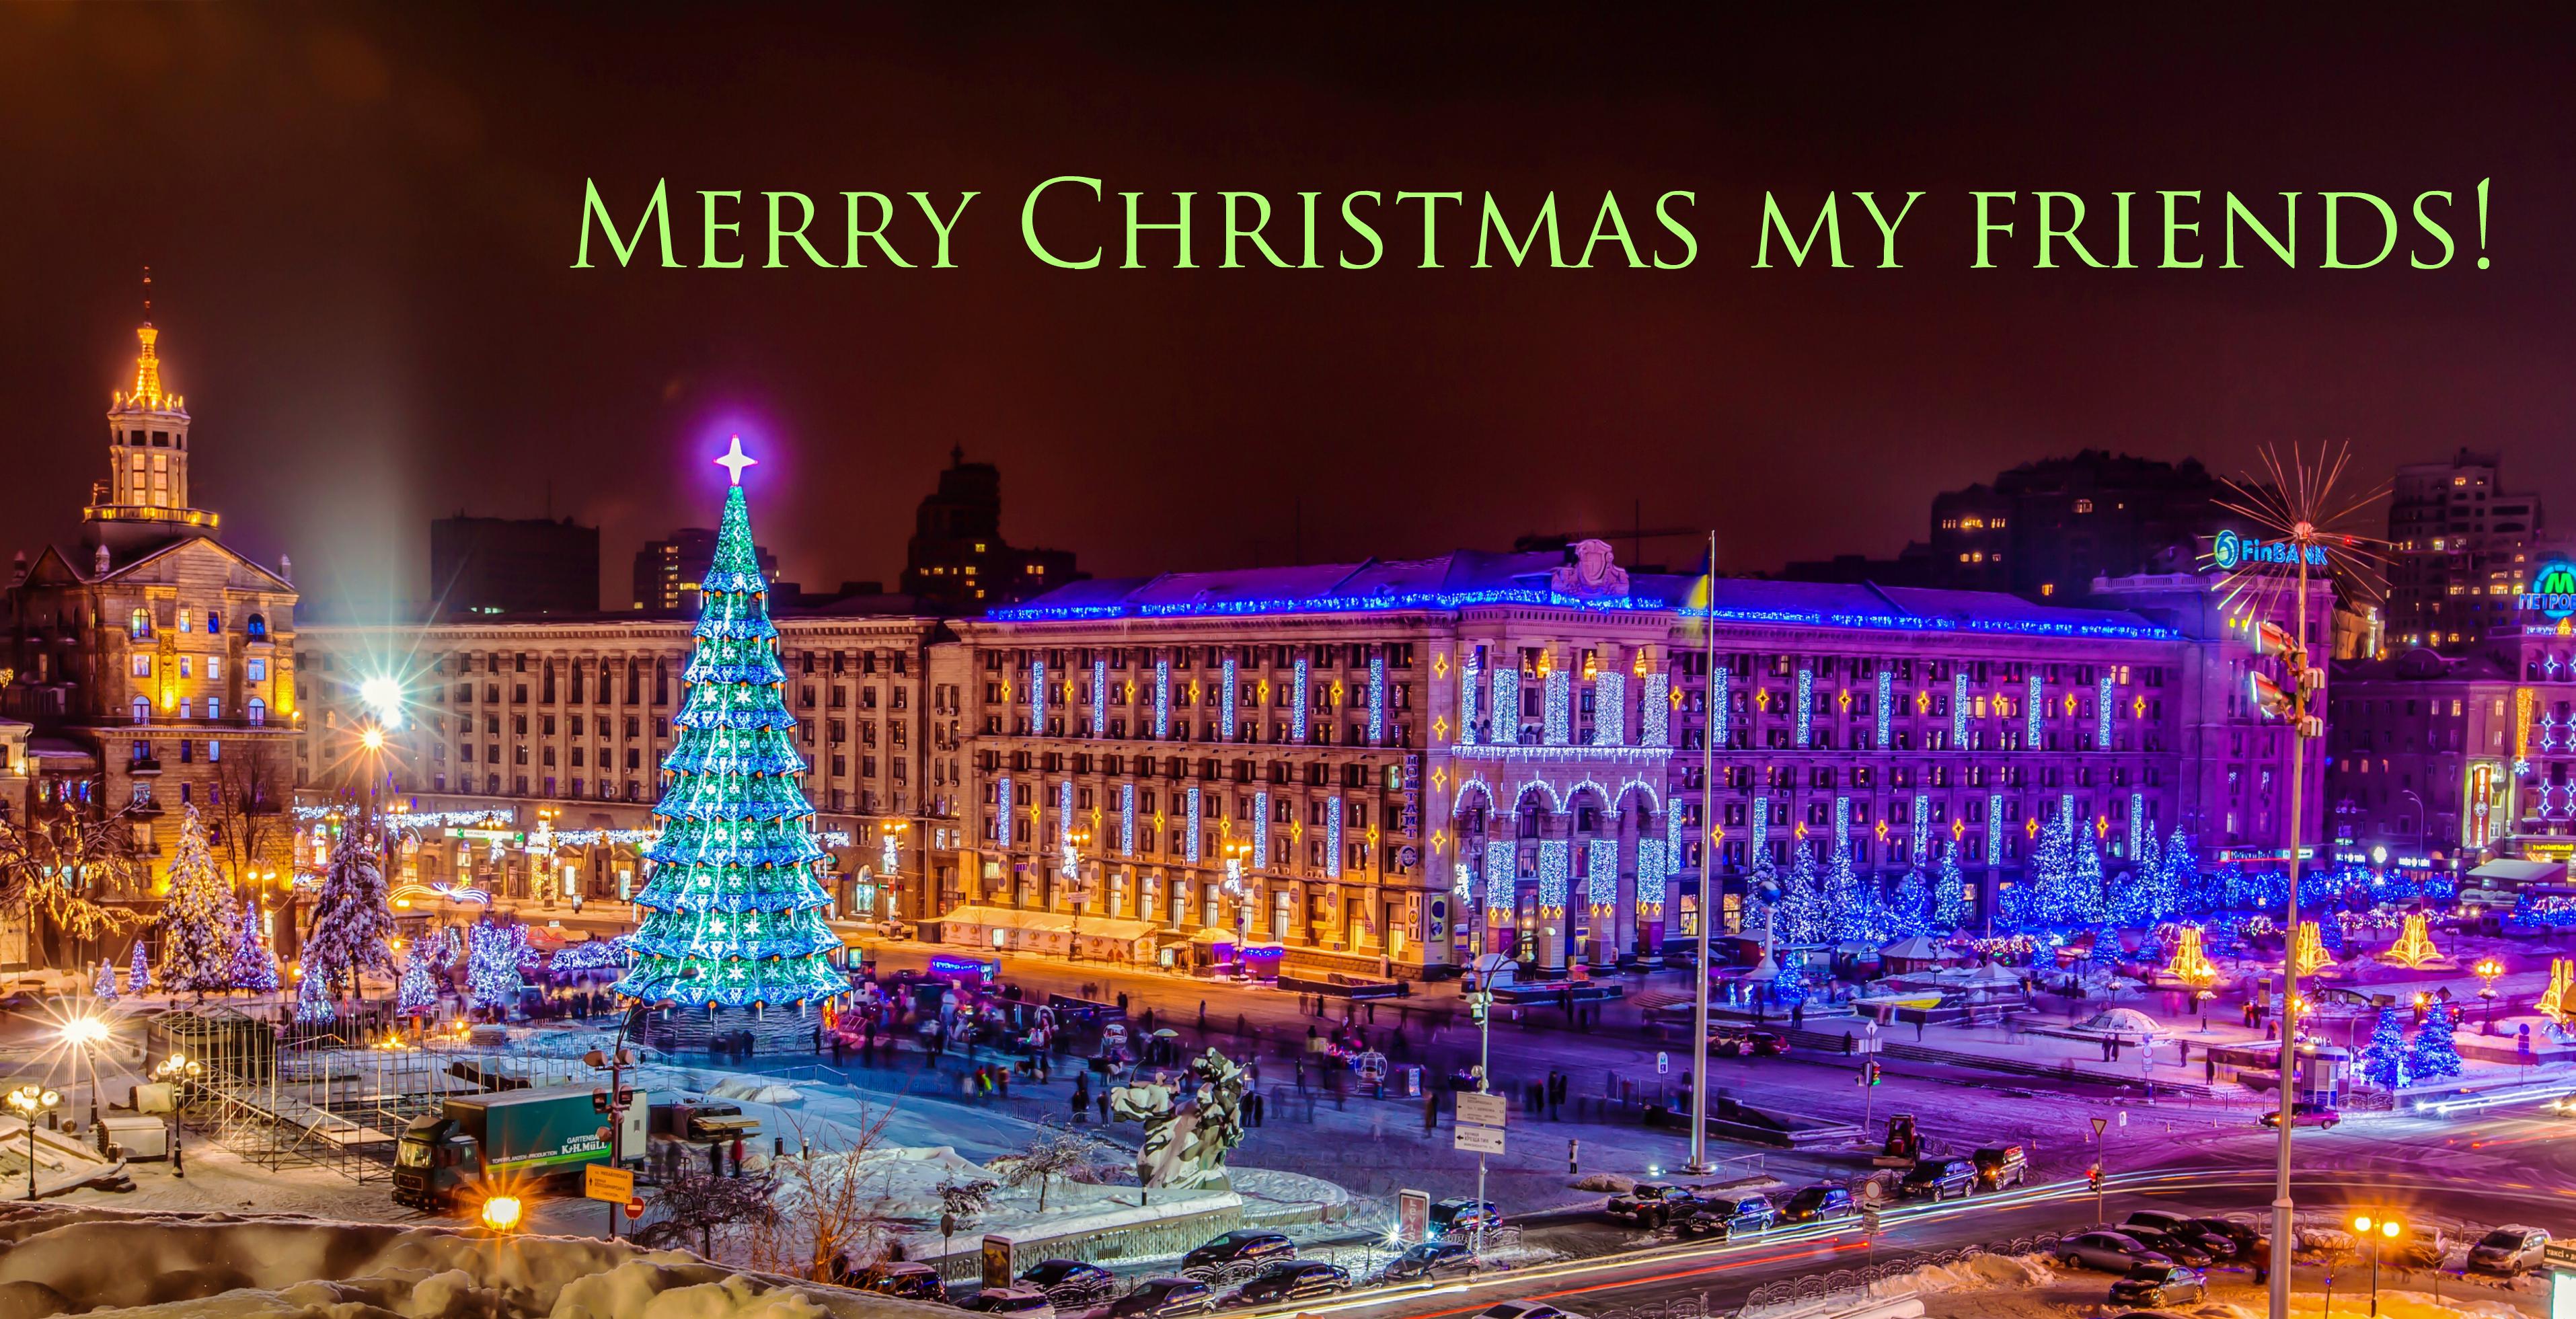 File:Merry Christmas my friends from Kiev Ukraine (8305920555).jpg ...